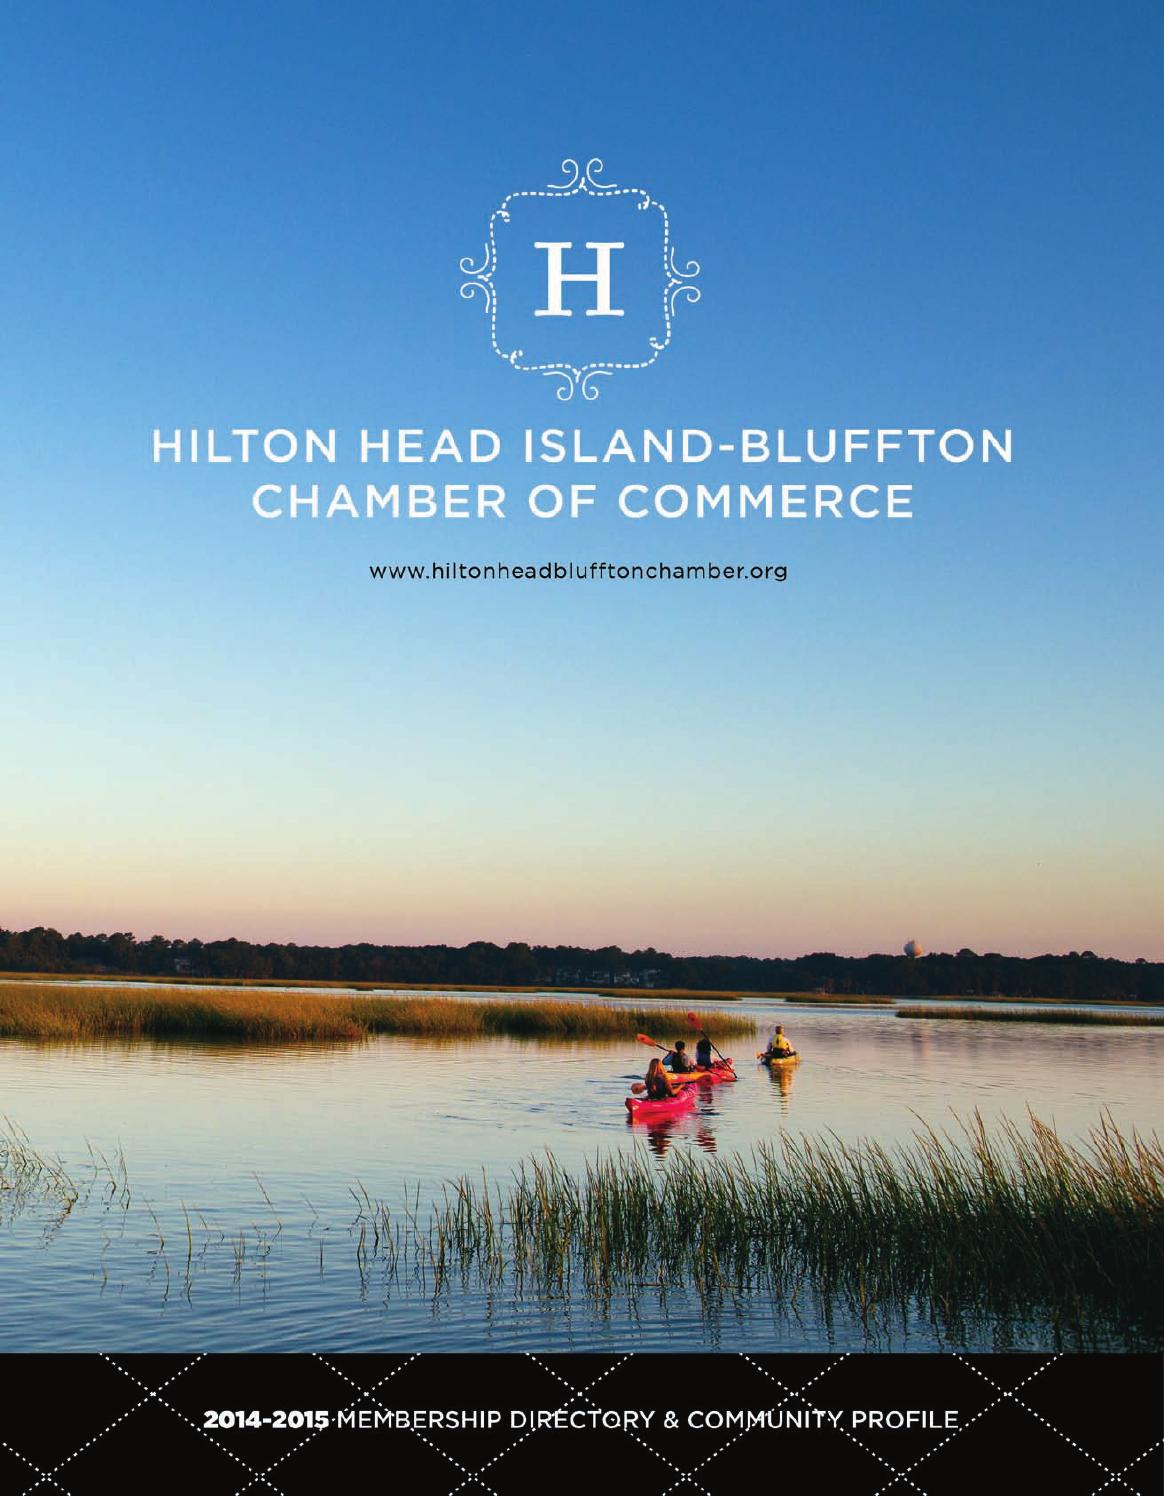 Hilton Head SC Community Profile by Townsquare Publications, LLC - issuu